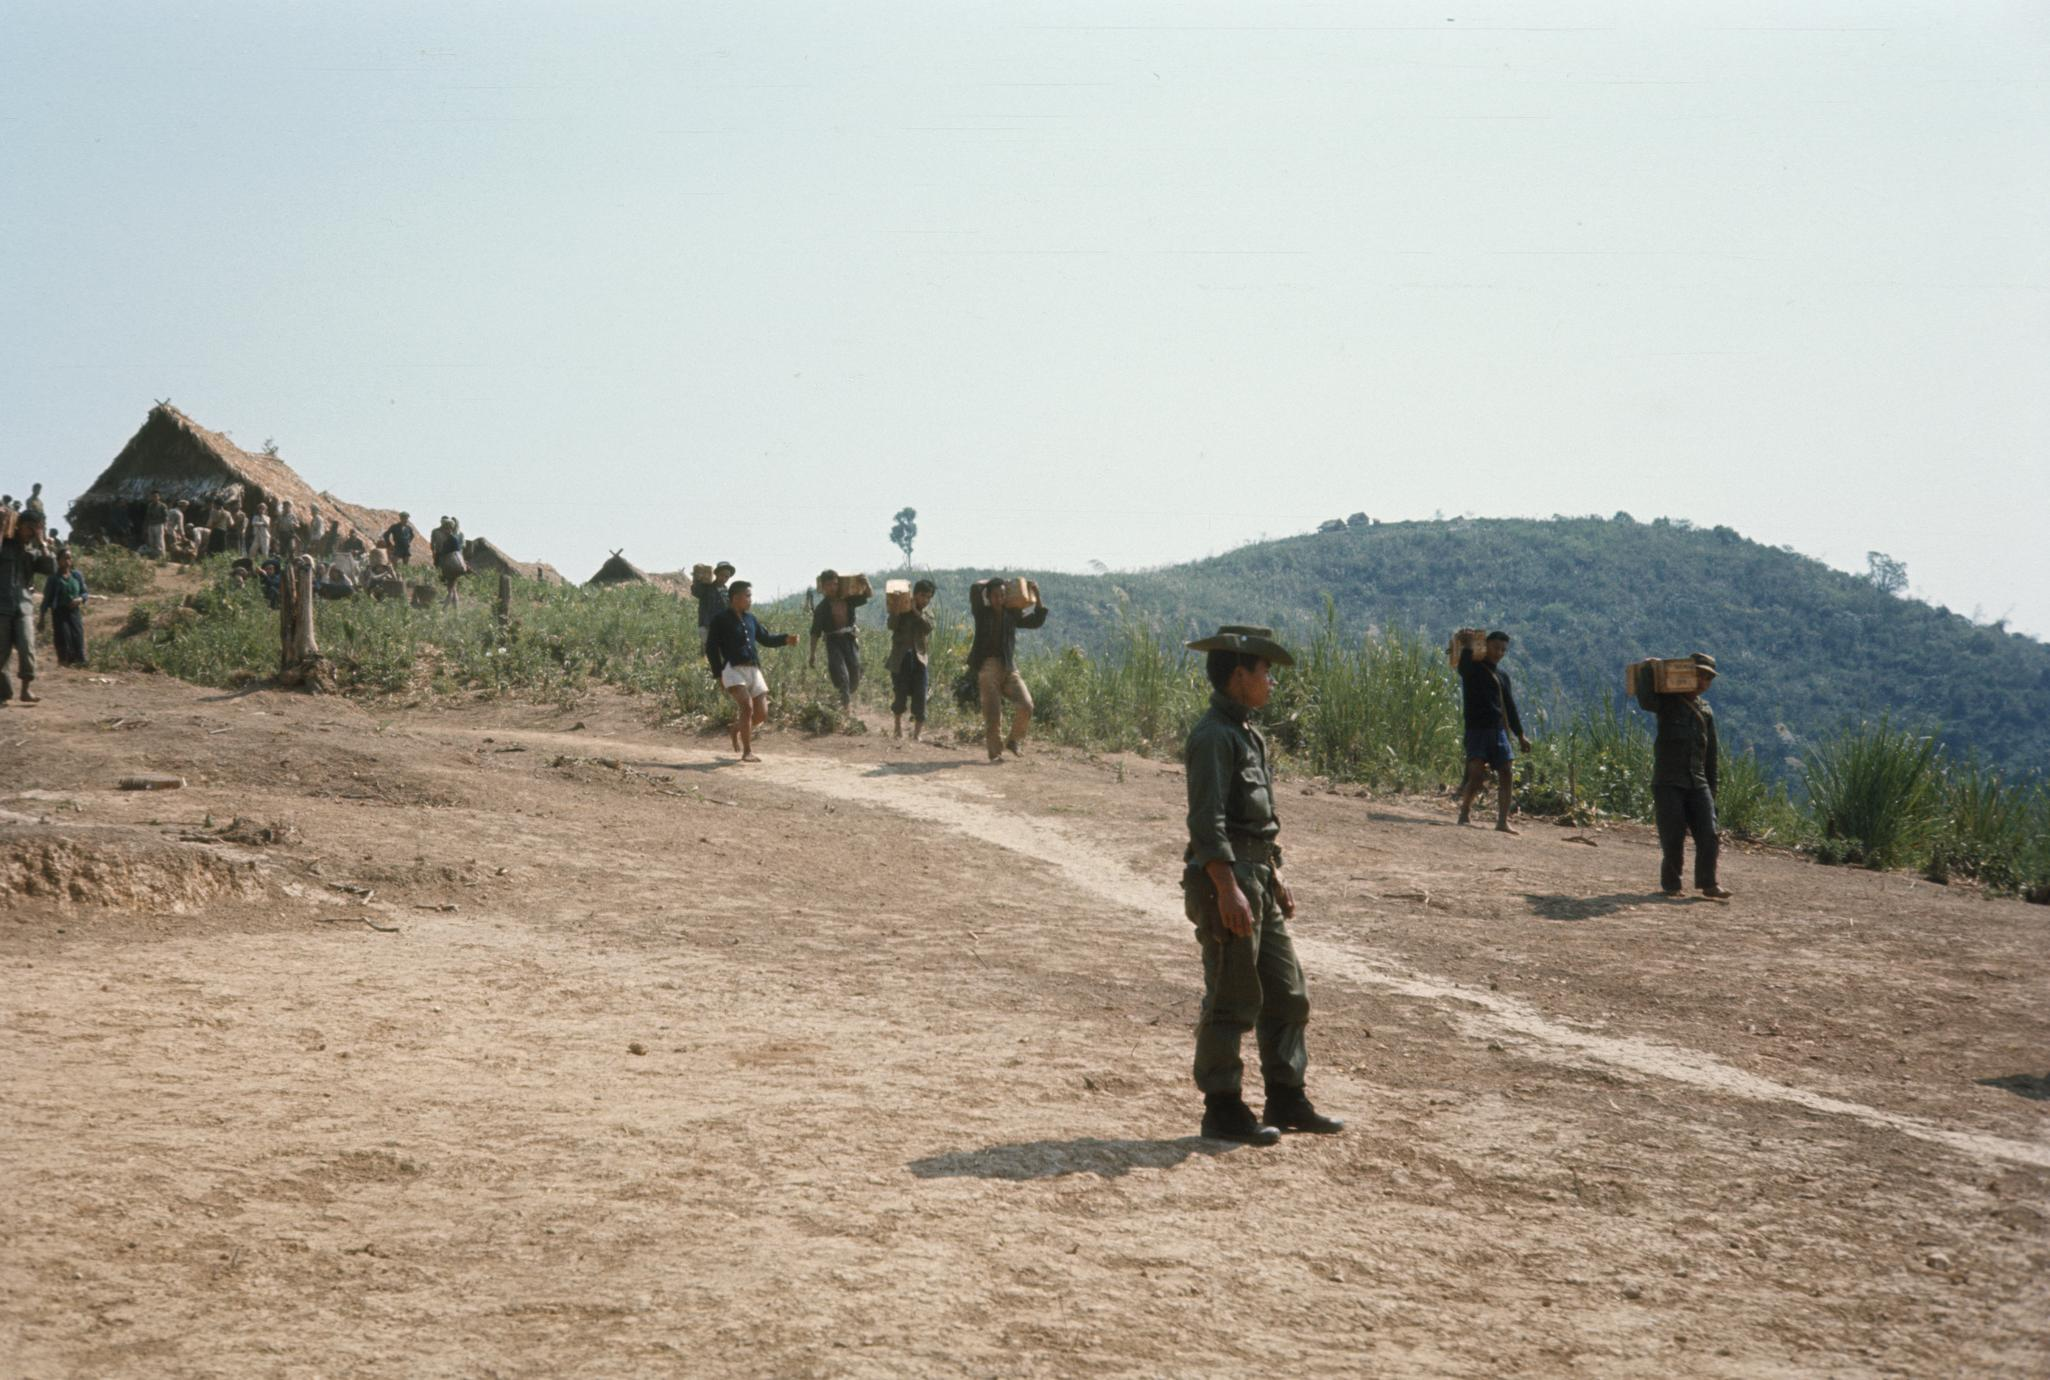 Men carrying ammunition